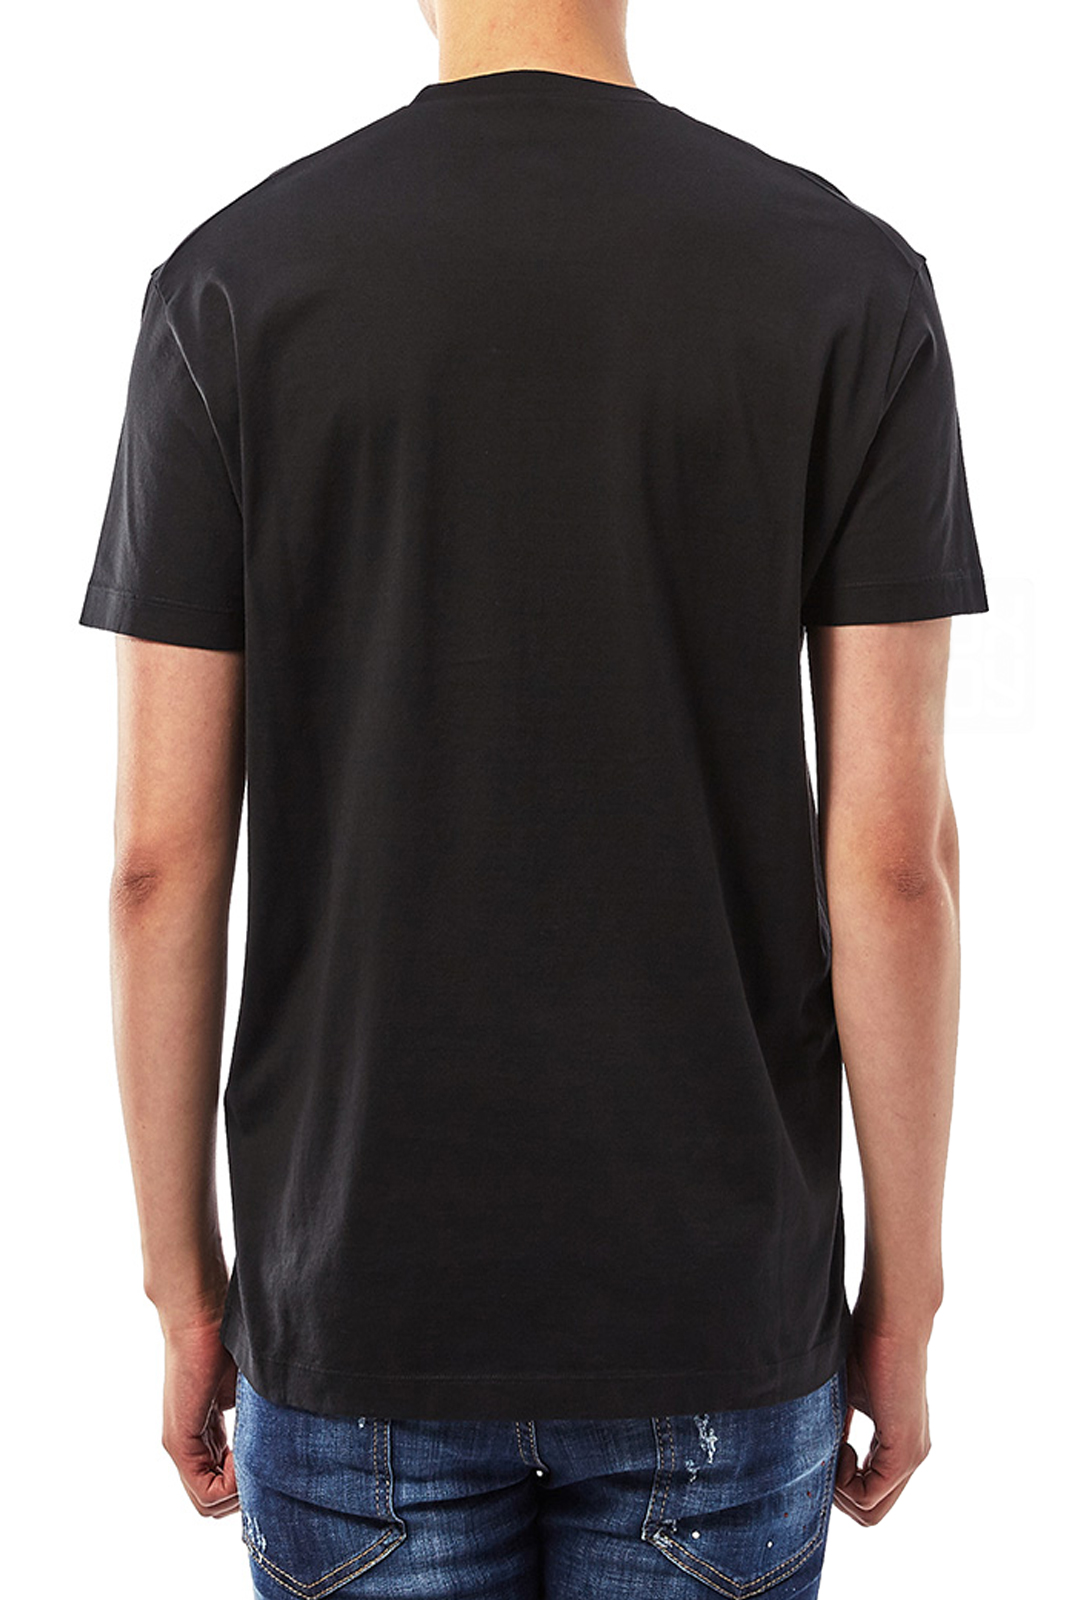 Tee-shirts  Dsquared2 S74GD0446 900 NOIR